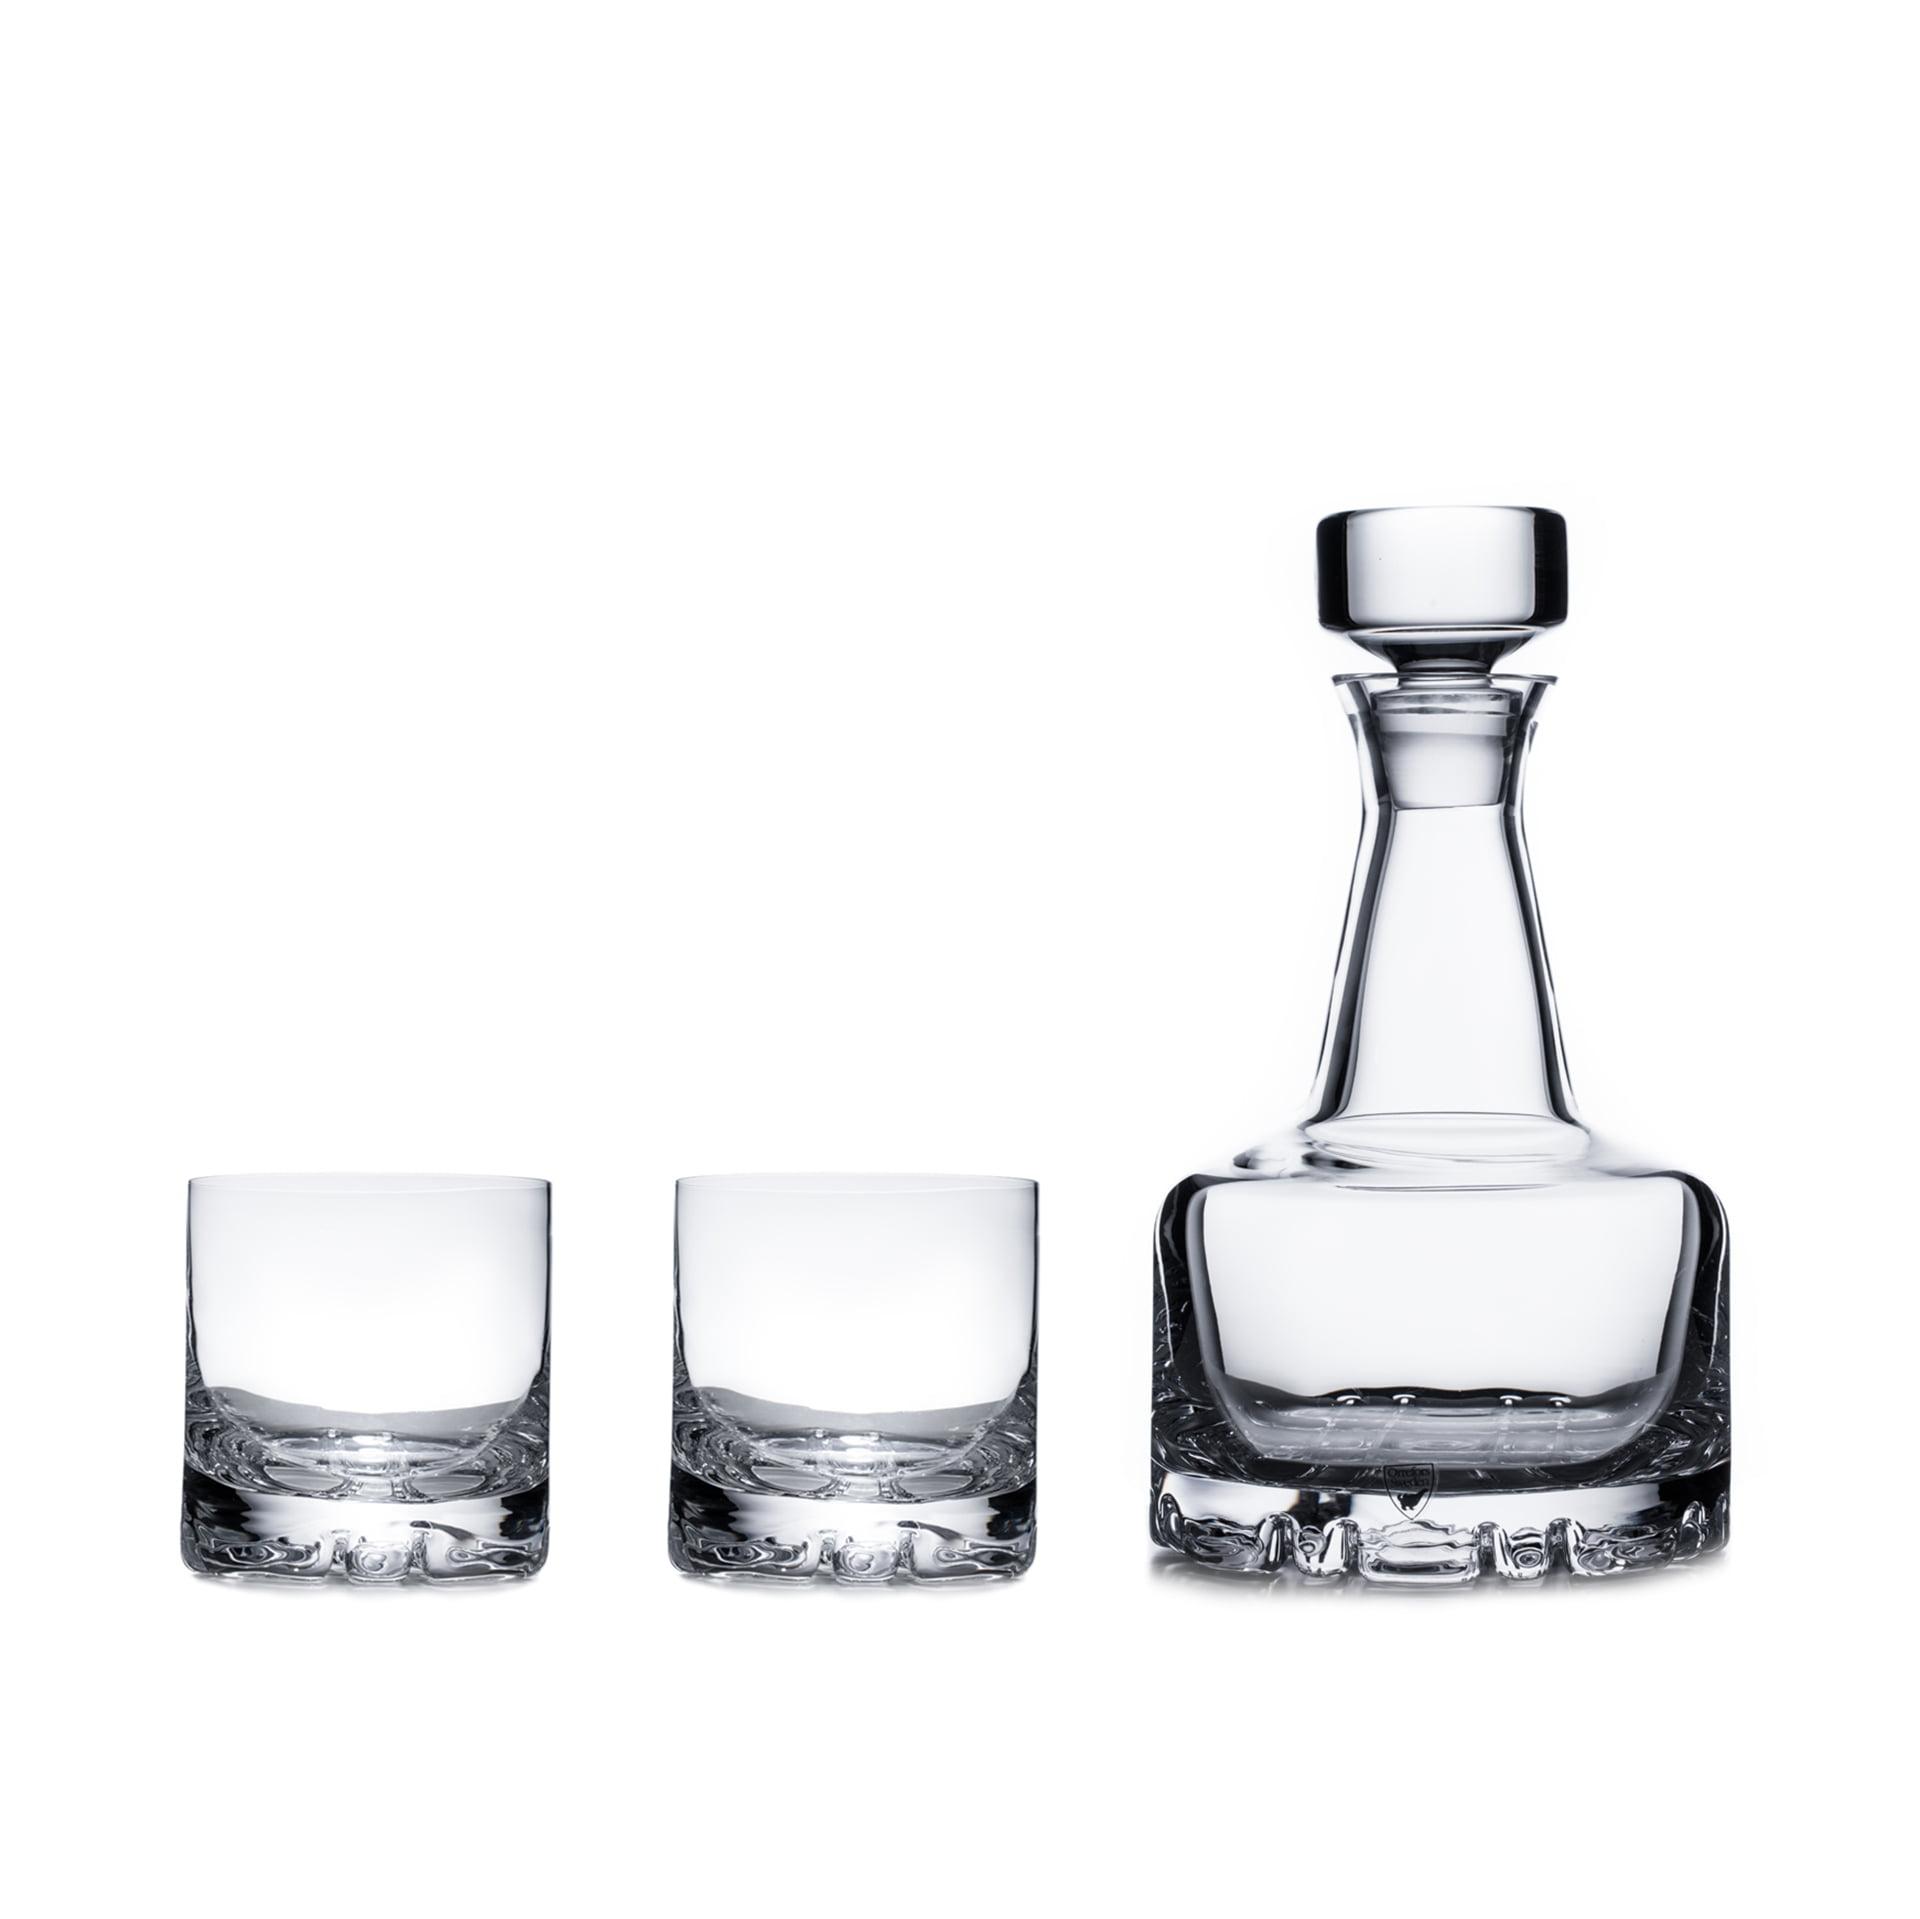 Erik Orrefors glas